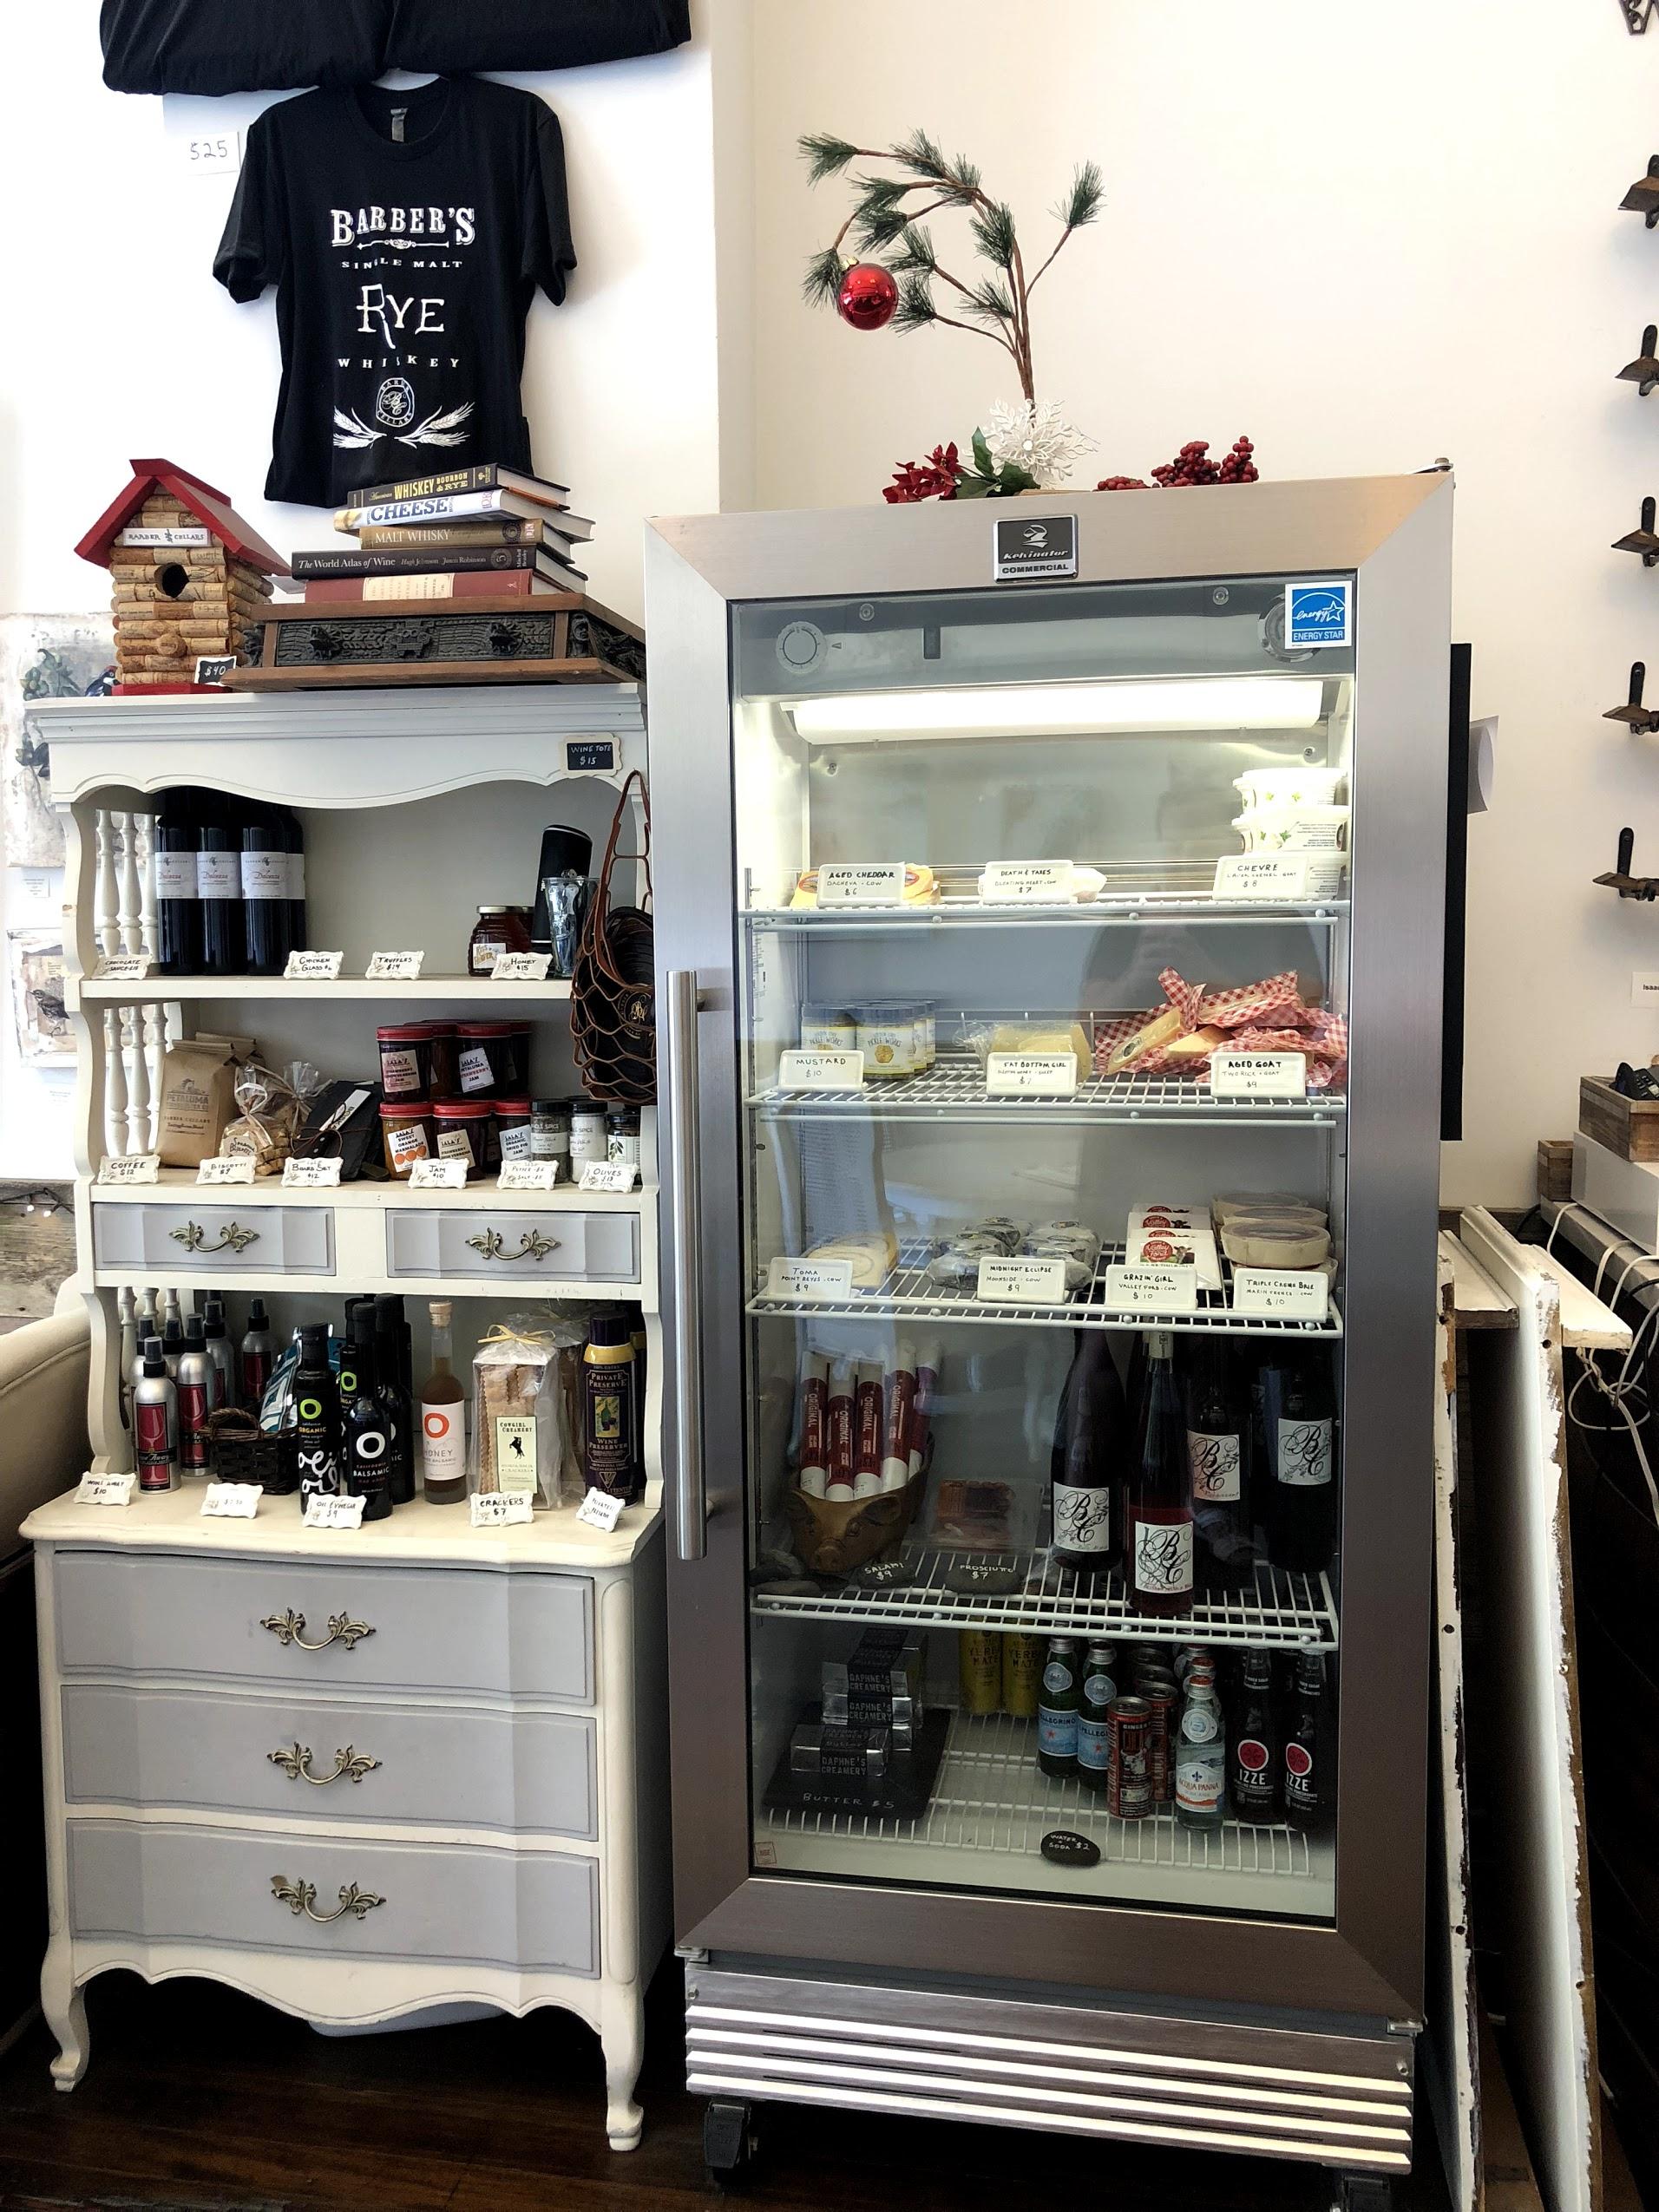 Barber Cellars Cheese